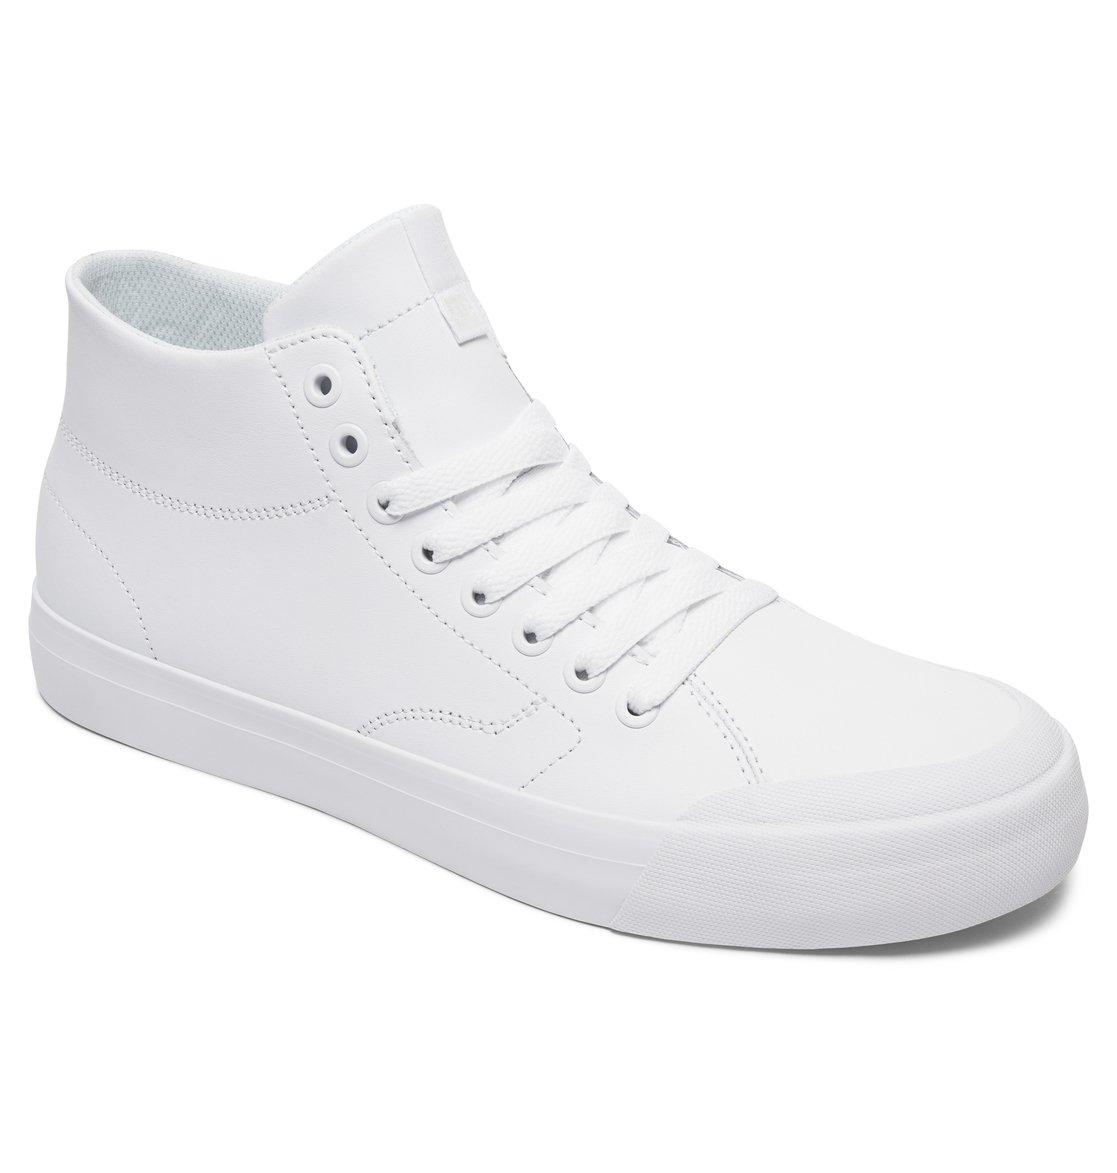 Zapatos blancos DC Shoes Evan para mujer hh2Rah1Lc